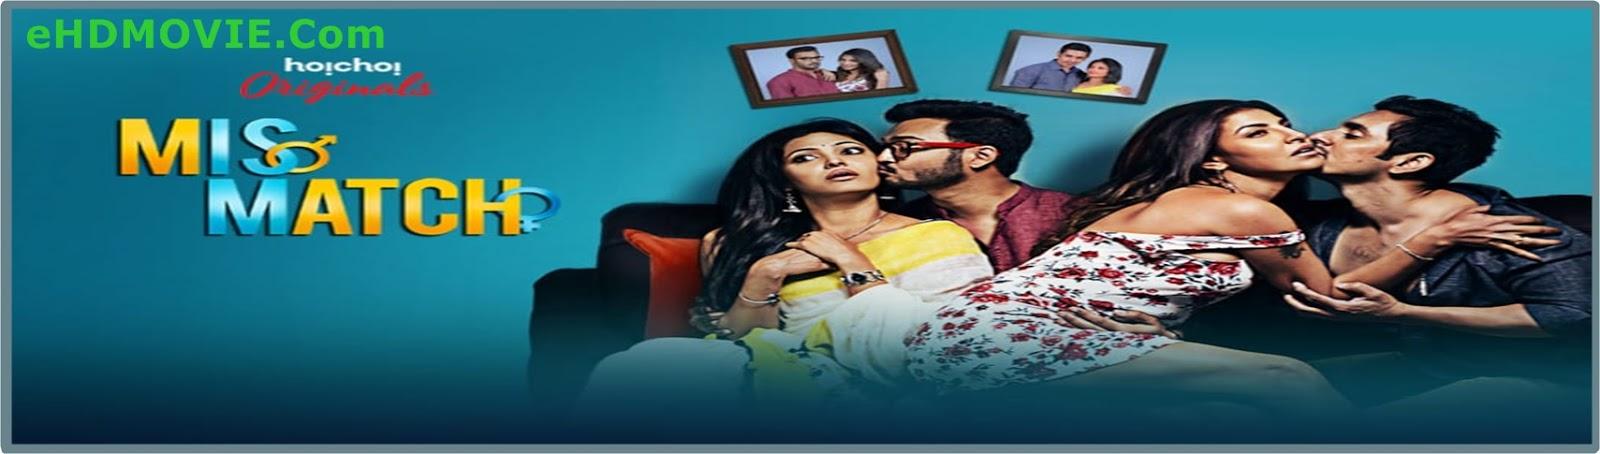 Mismatch 2018 Bengali Web Series All Episode Original 480p - 720p ORG WEB-DL 550MB - 1.2GB